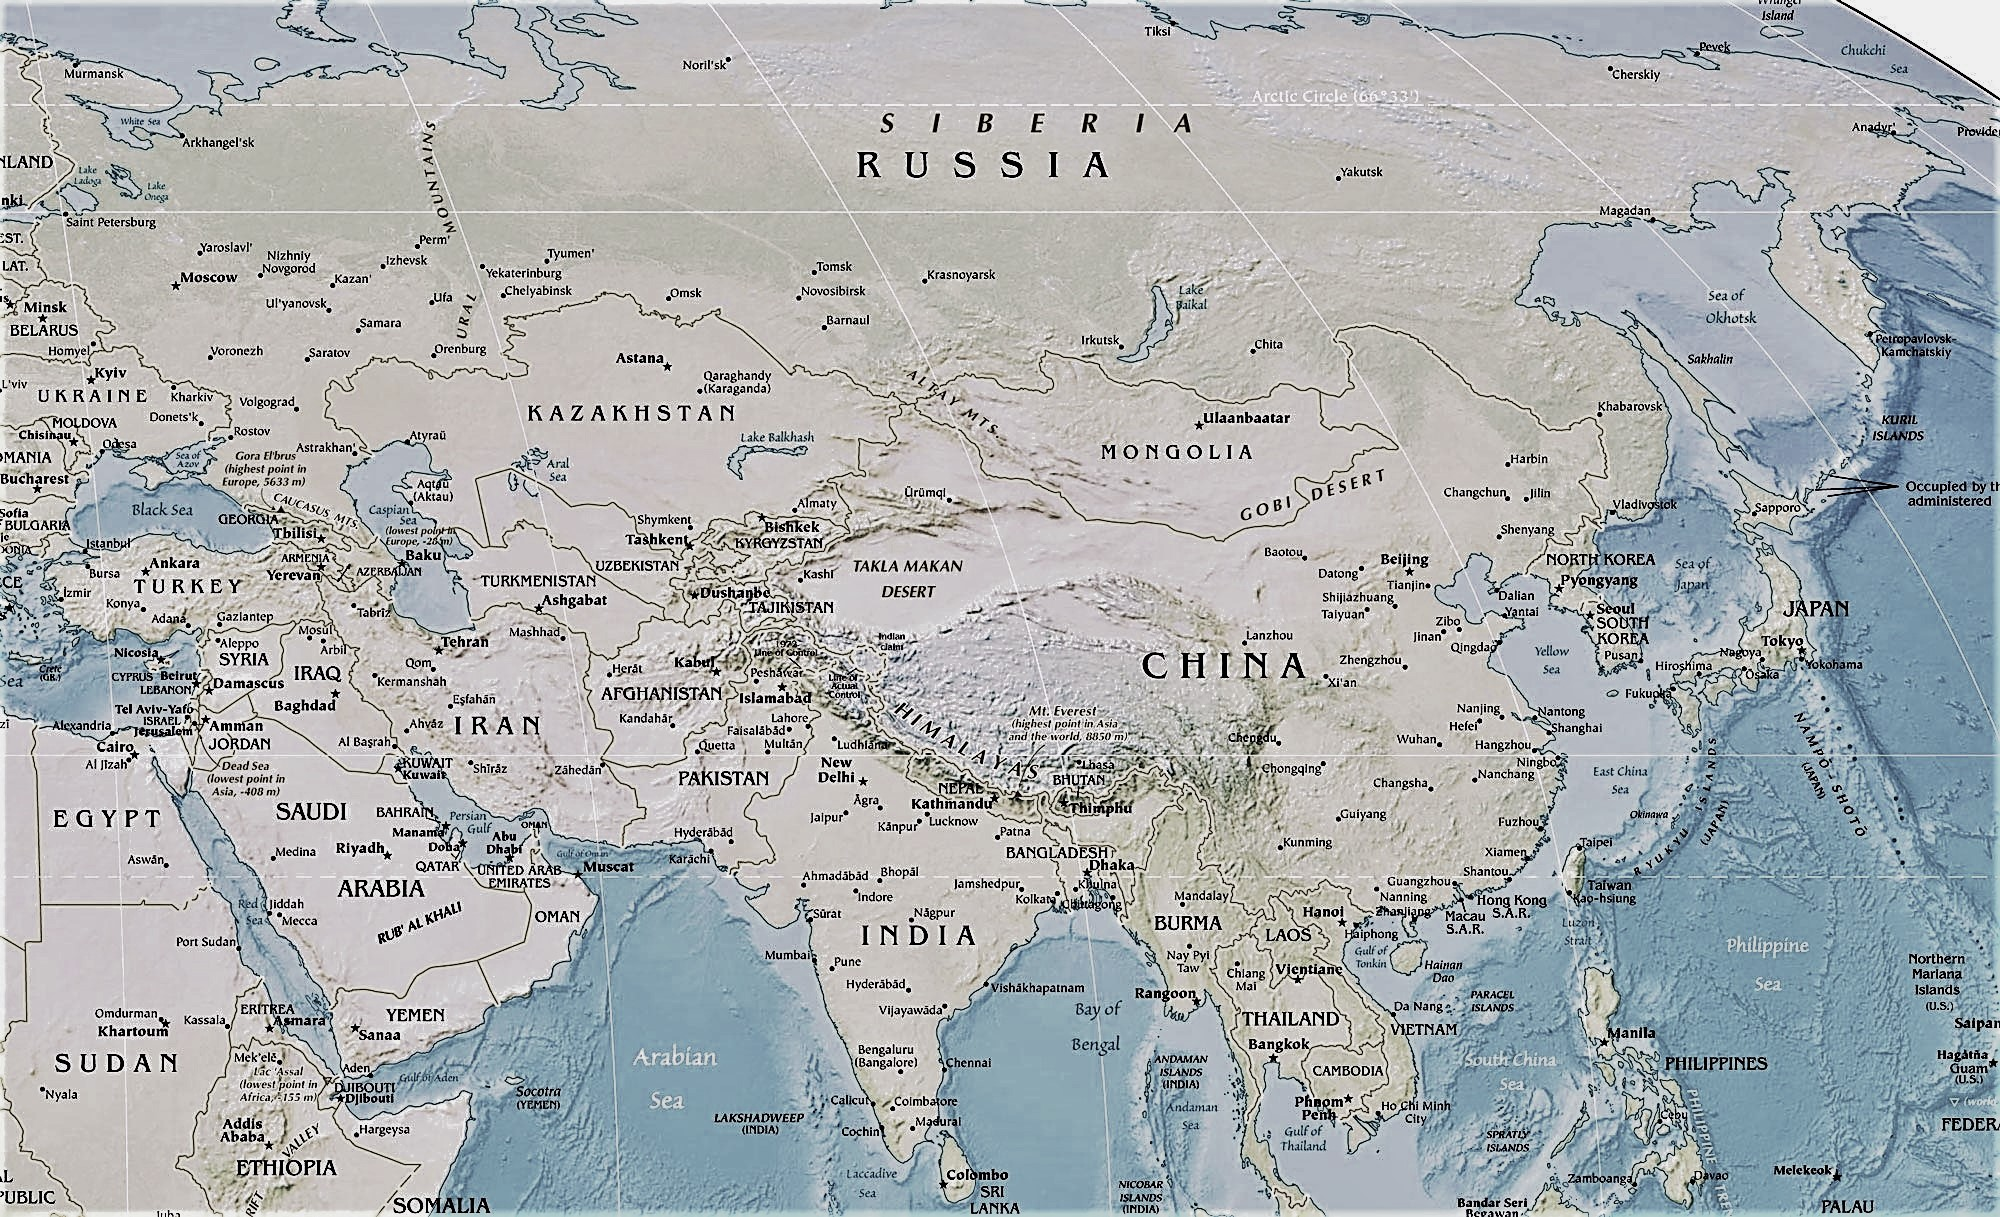 Mapa Mudo Asia Fisico.Mapa De Asia Para Imprimir Mapamundi Politico Fisico